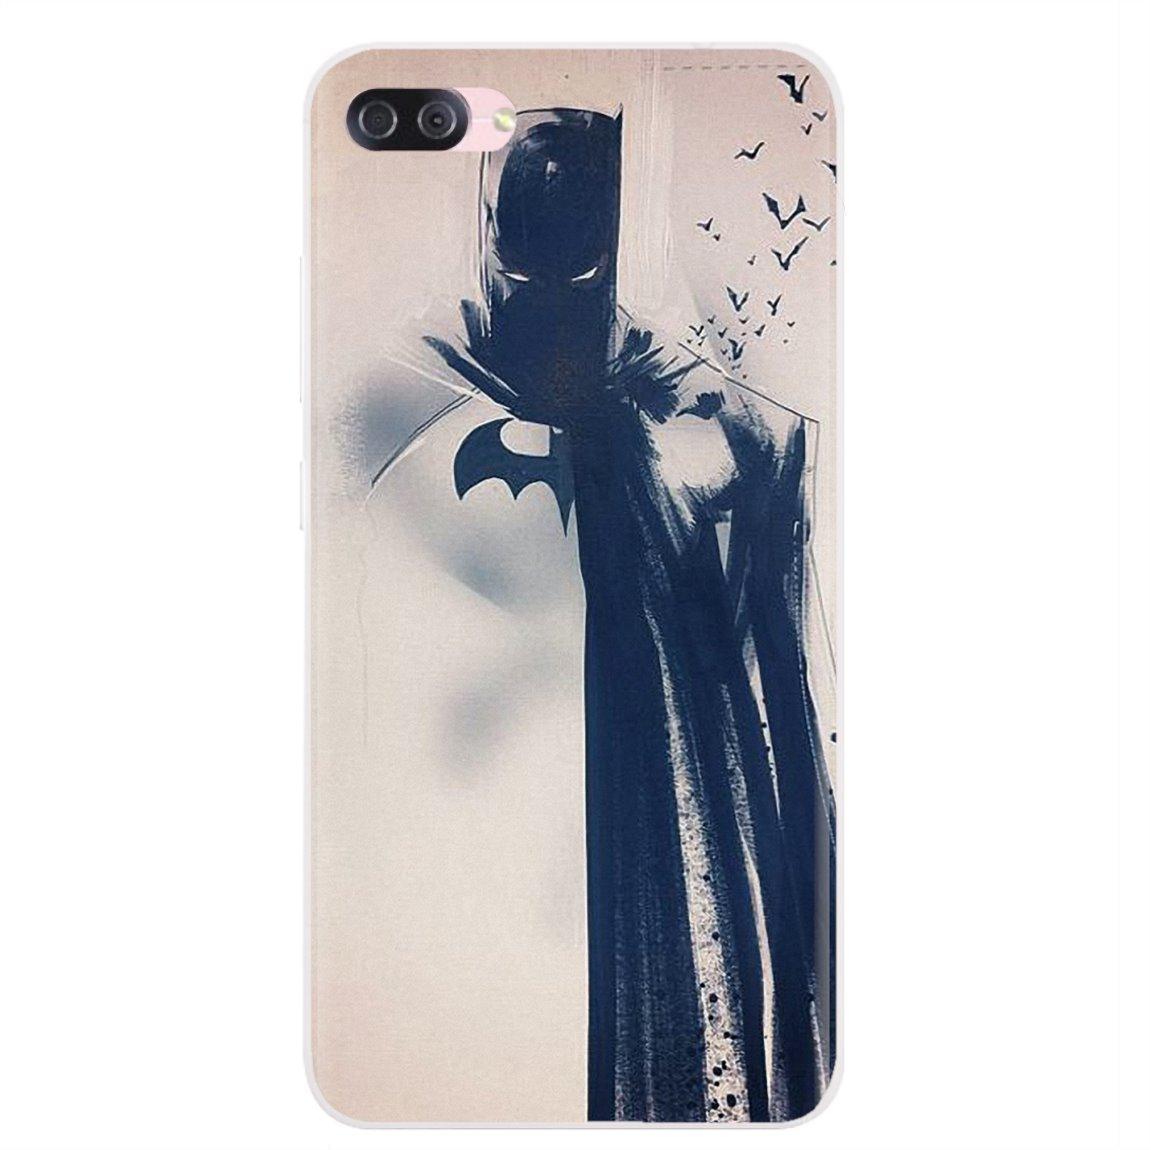 Para Samsung Galaxy J1 J2 J3 J4 J5 J6 J7 J8 Plus 2018 primer 2015 de 2016 2017 suave carcasa Super Héroes Batman Hombre Murciélago de Superman